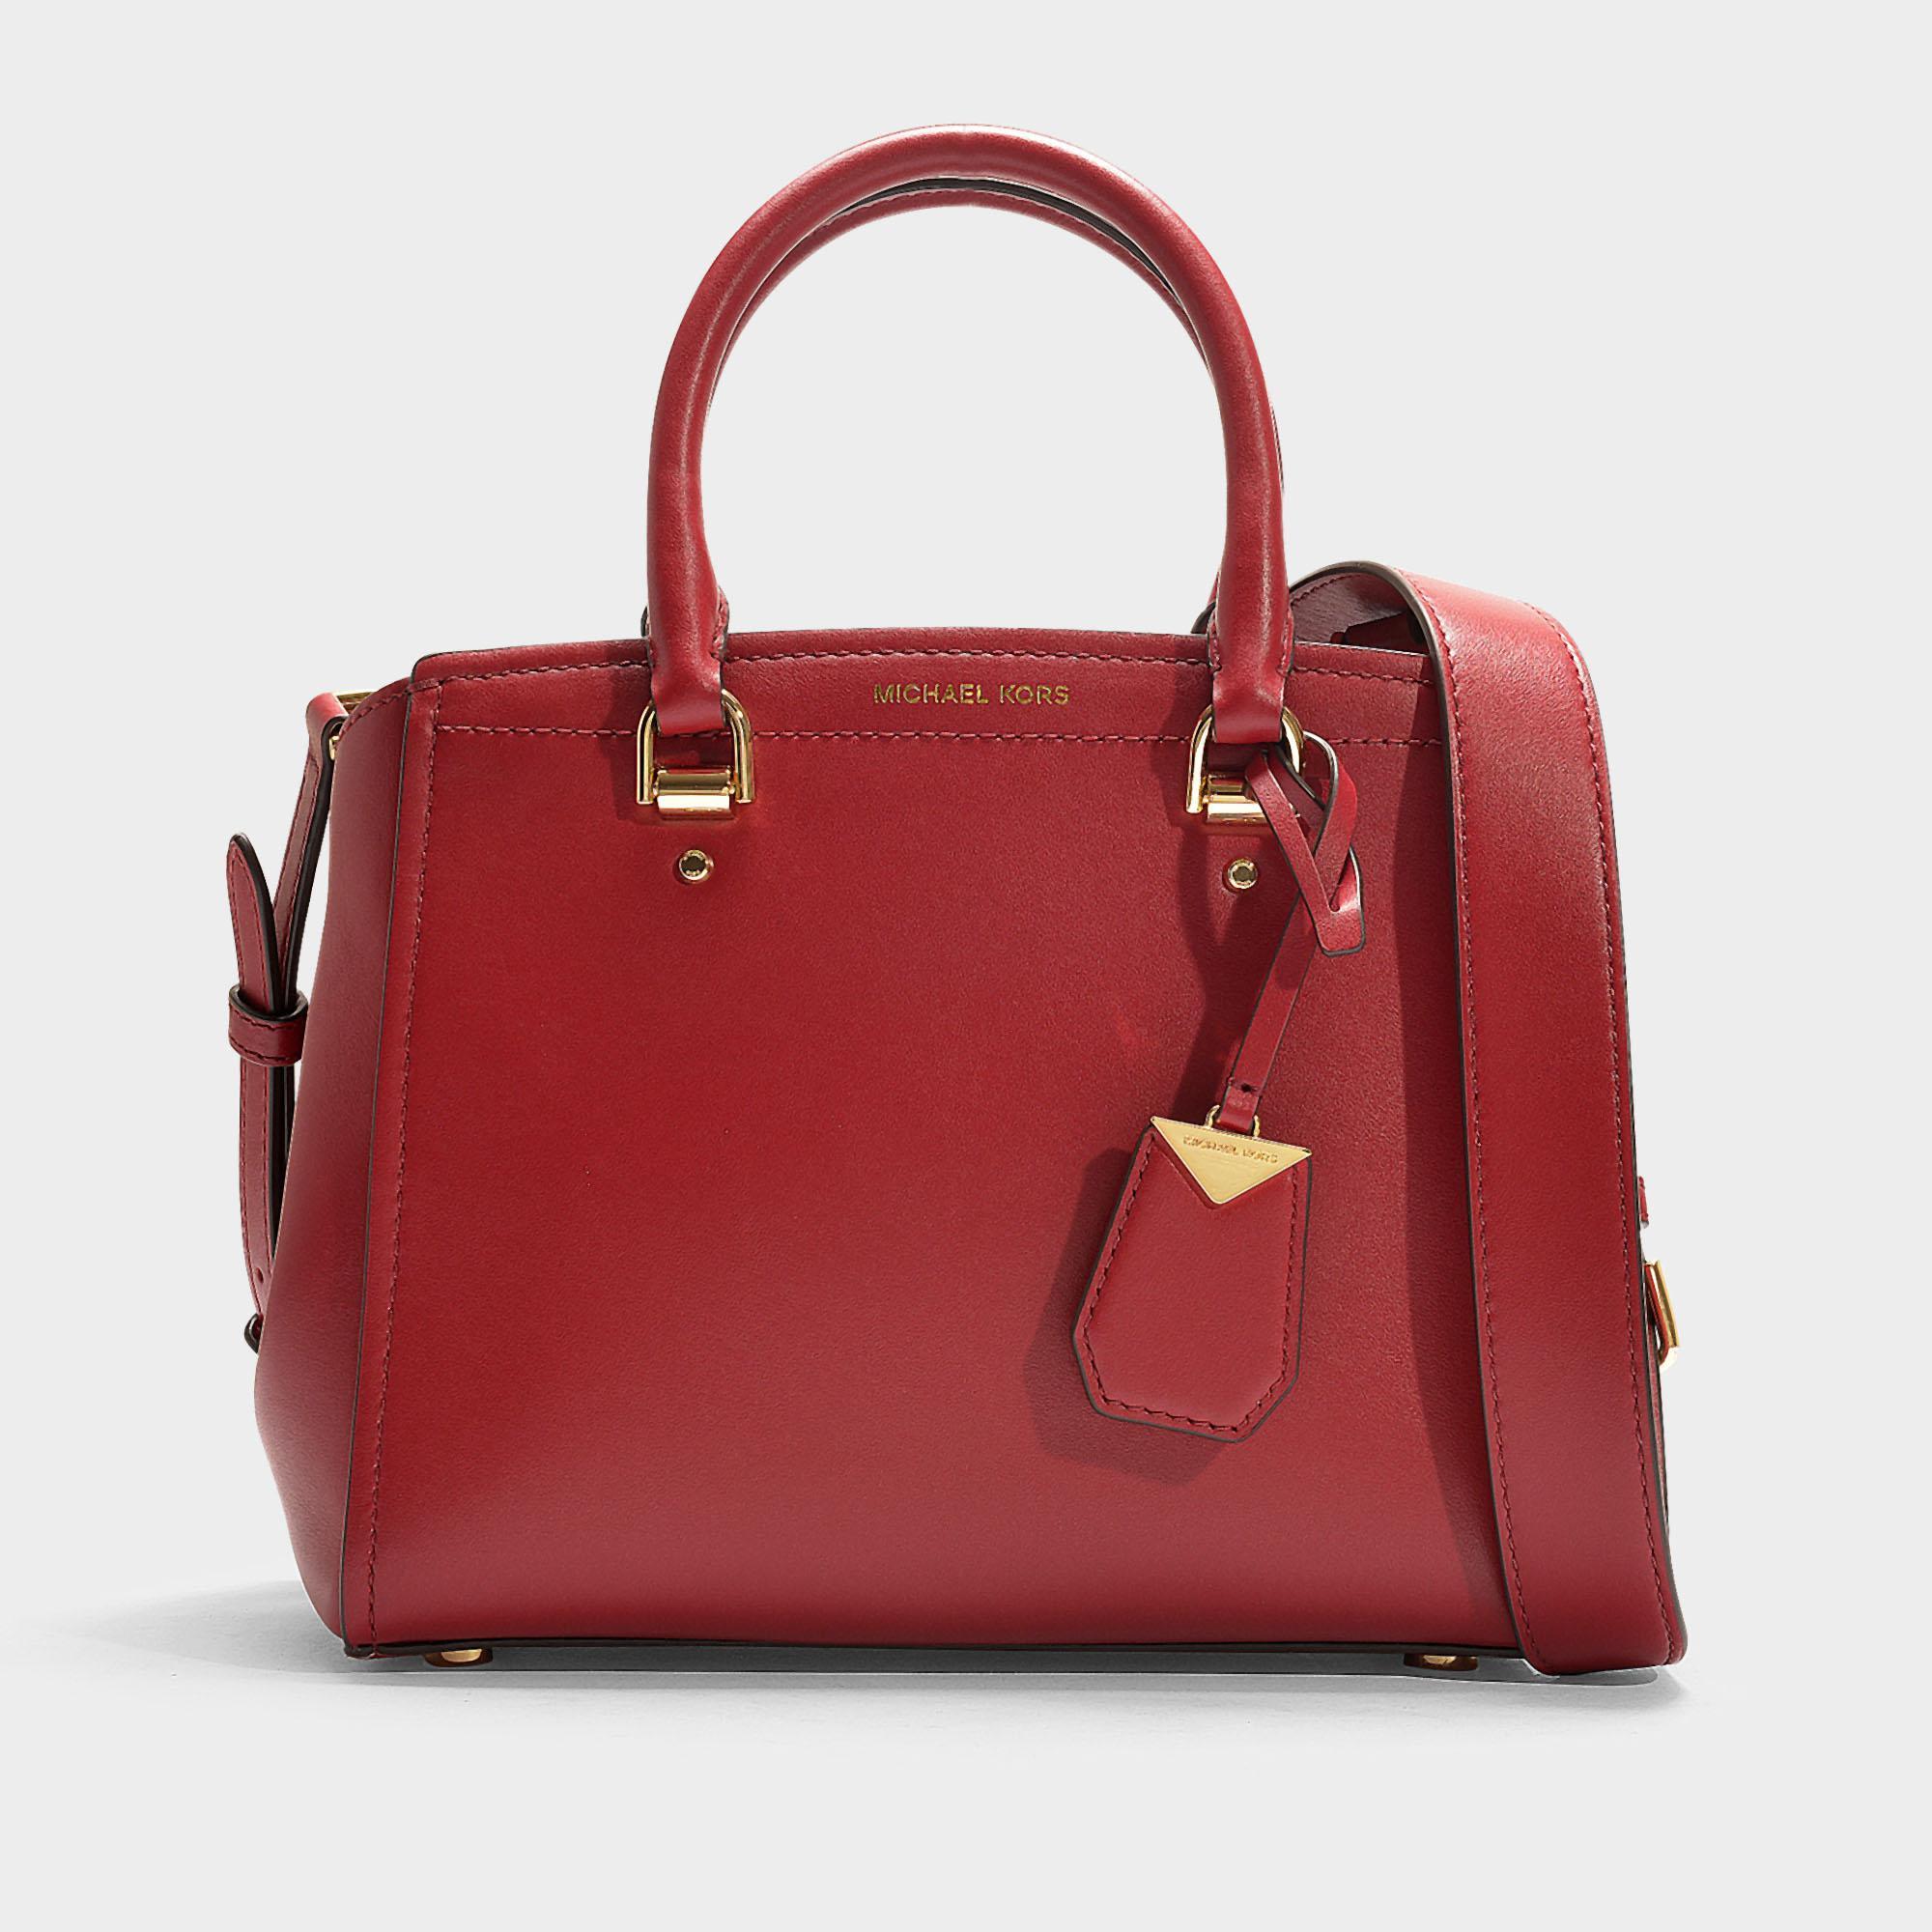 76829bd3e4f3 Lyst - MICHAEL Michael Kors Benning Medium Messenger Bag In Red ...